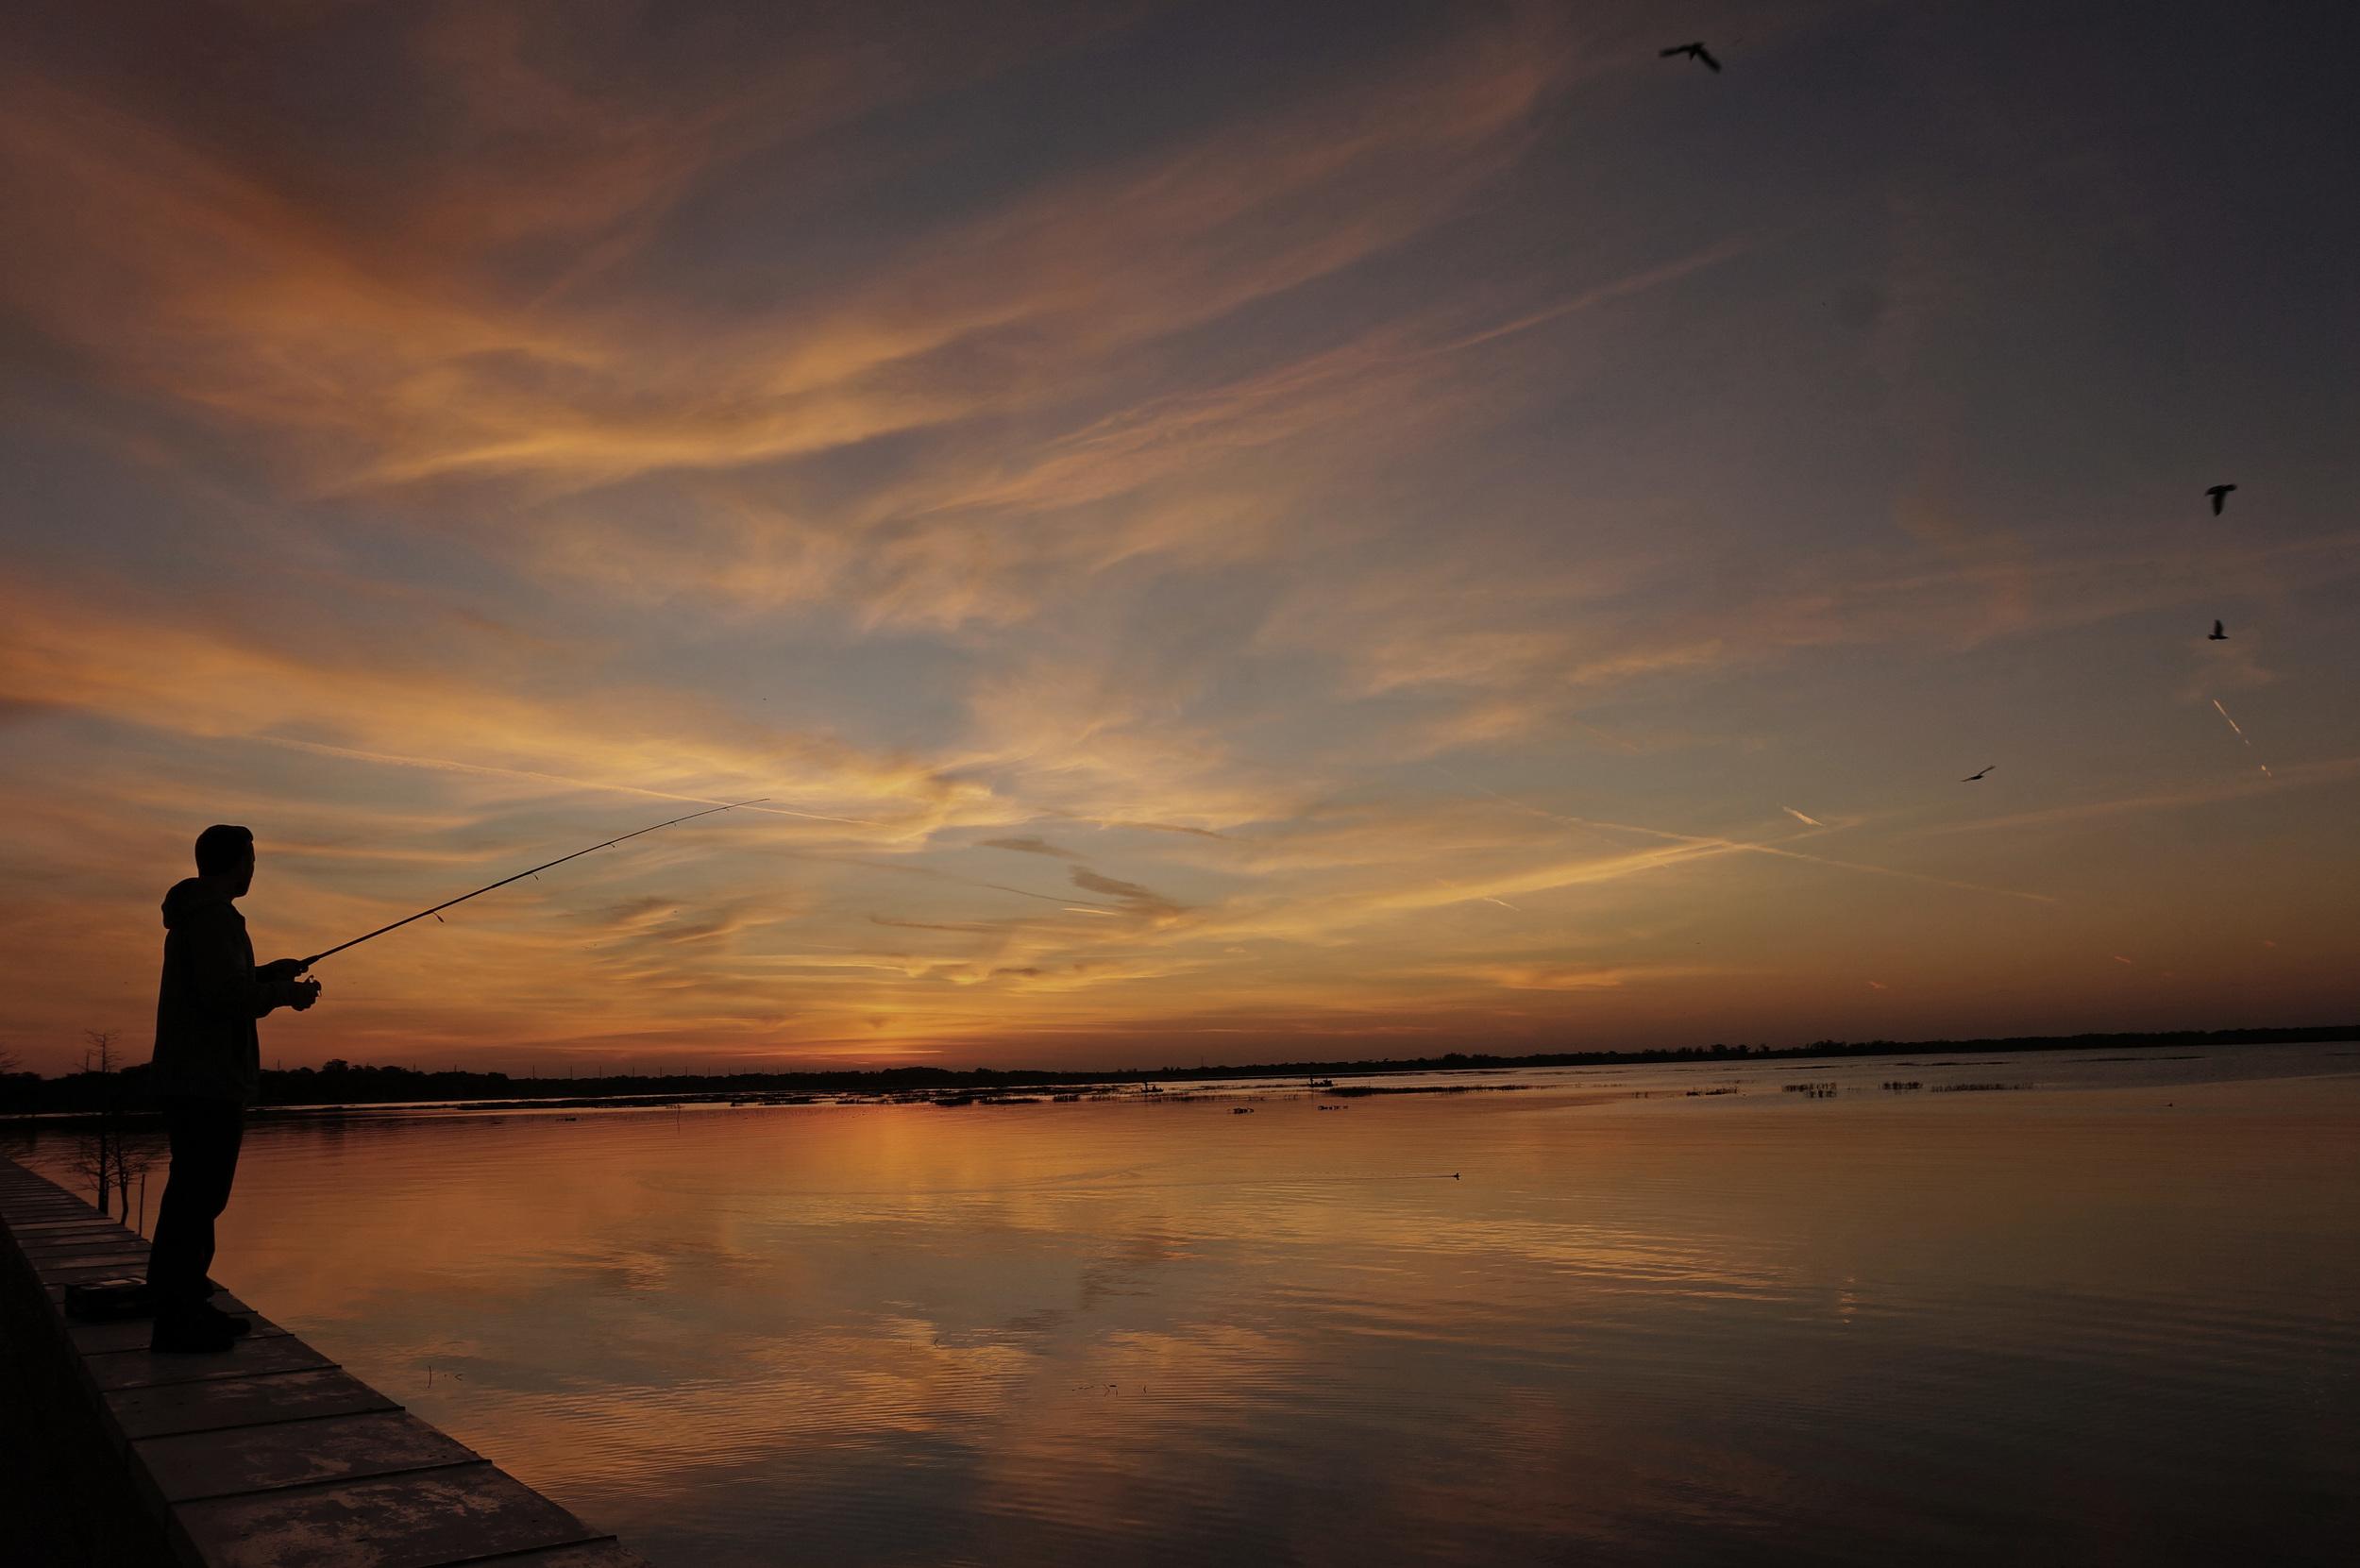 Sunrise over Lake Toho, Kissimmee Florida